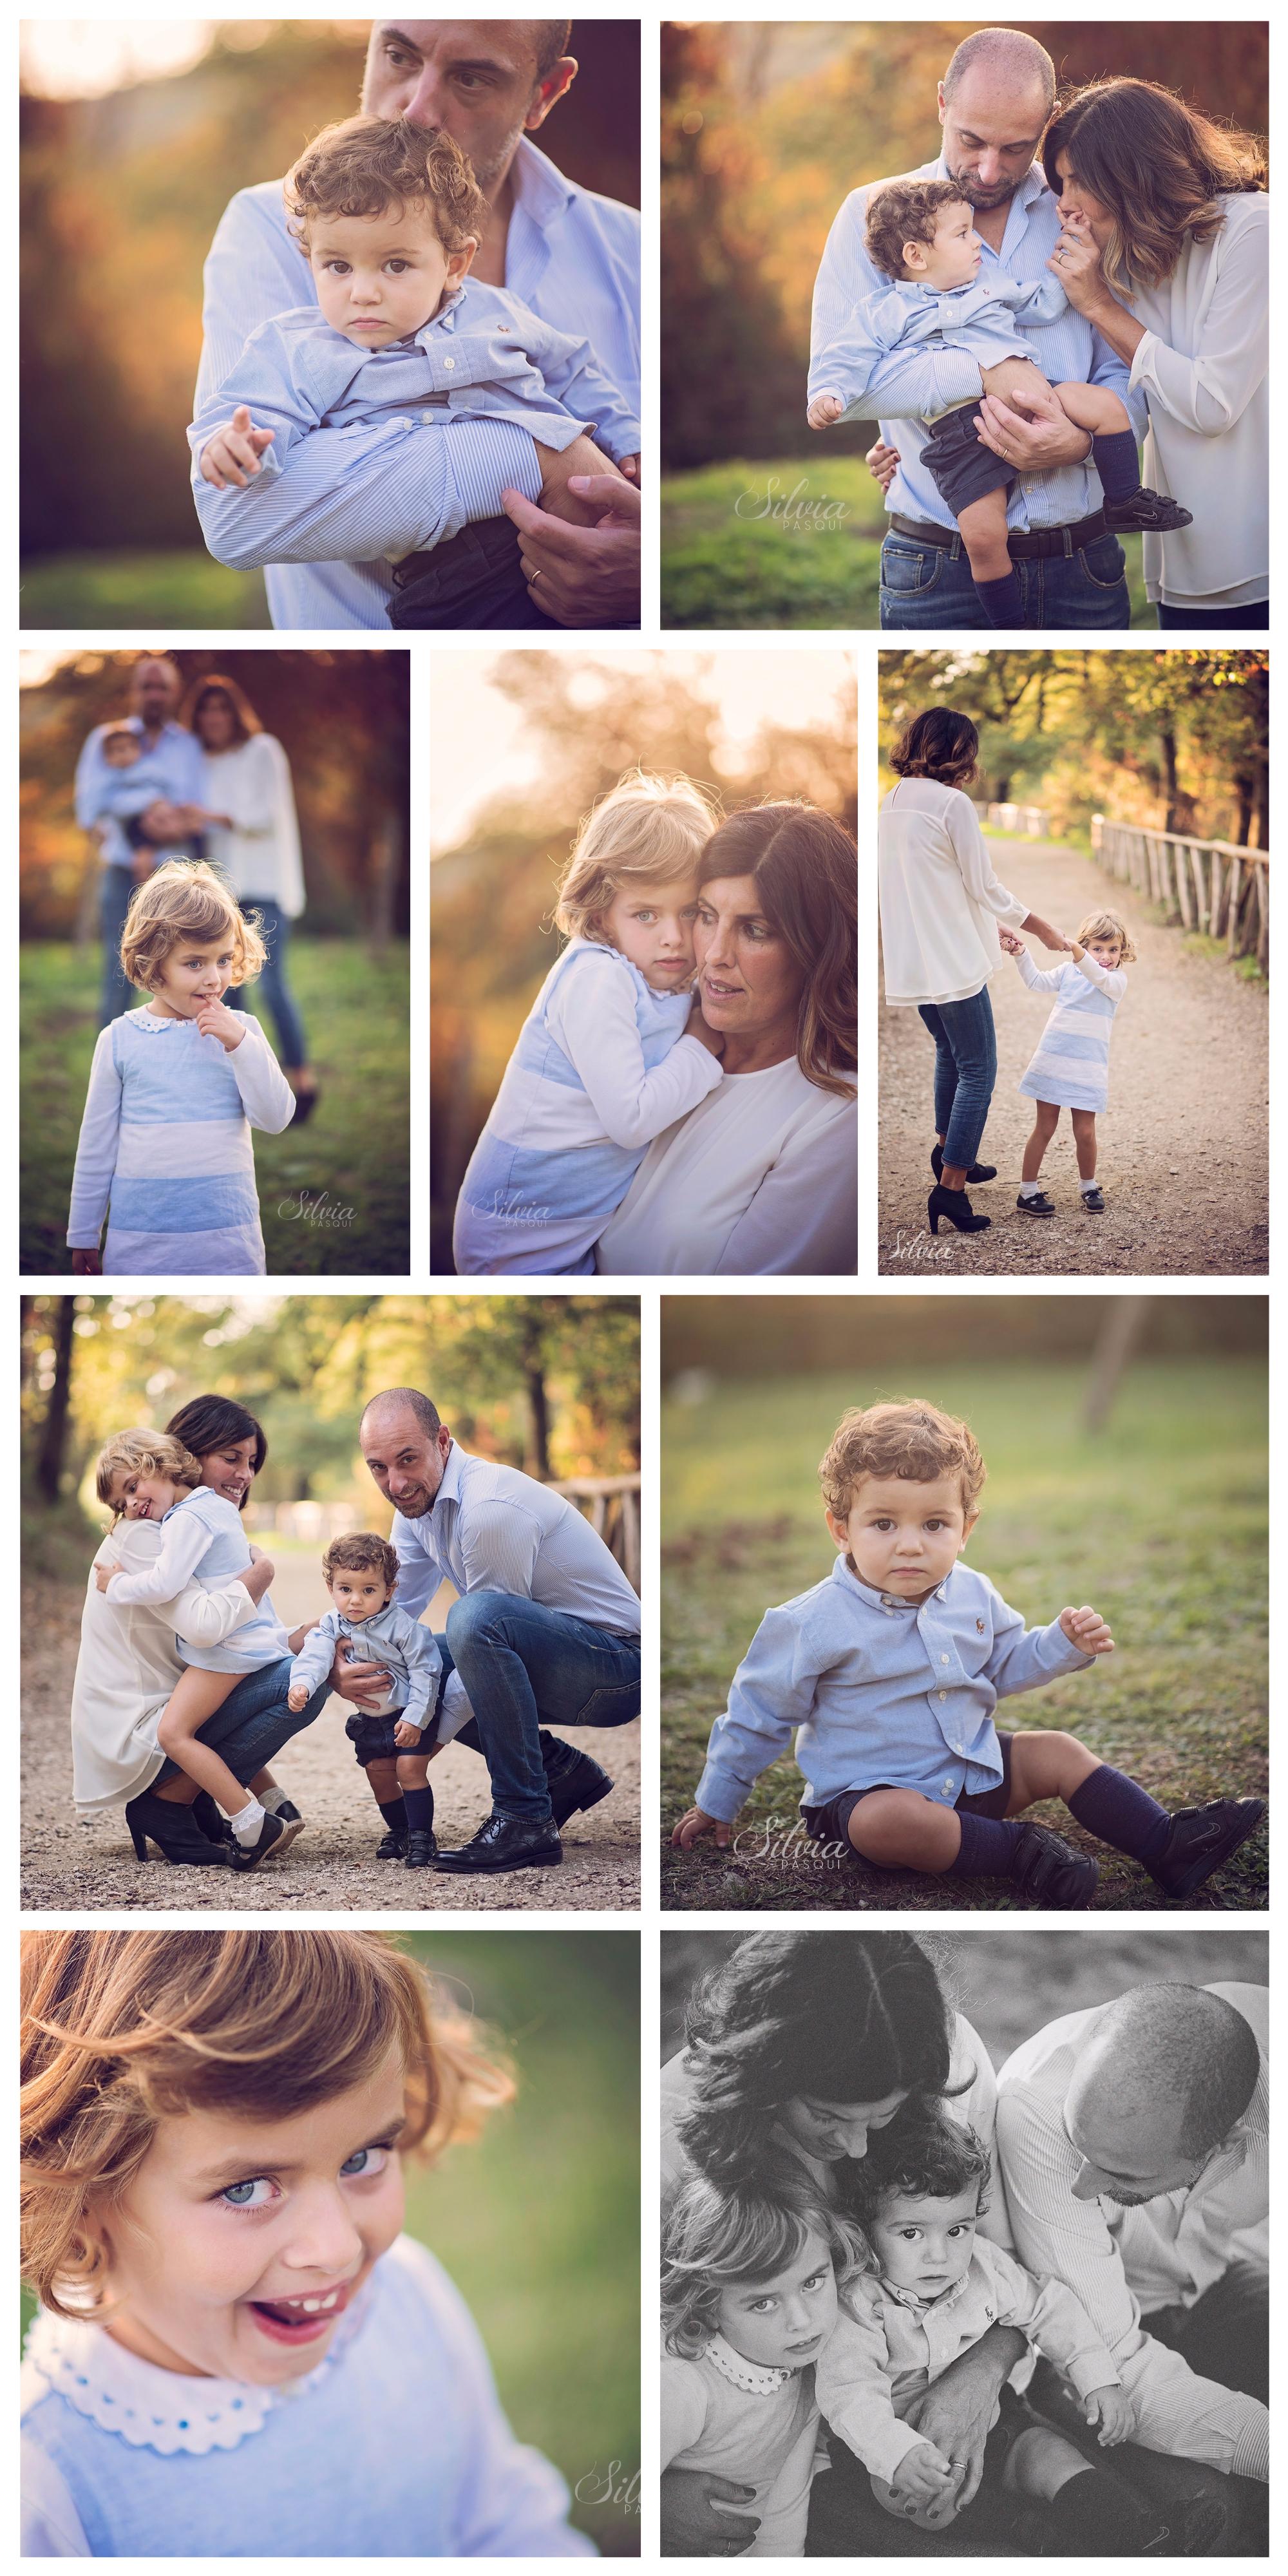 fotografa famiglie